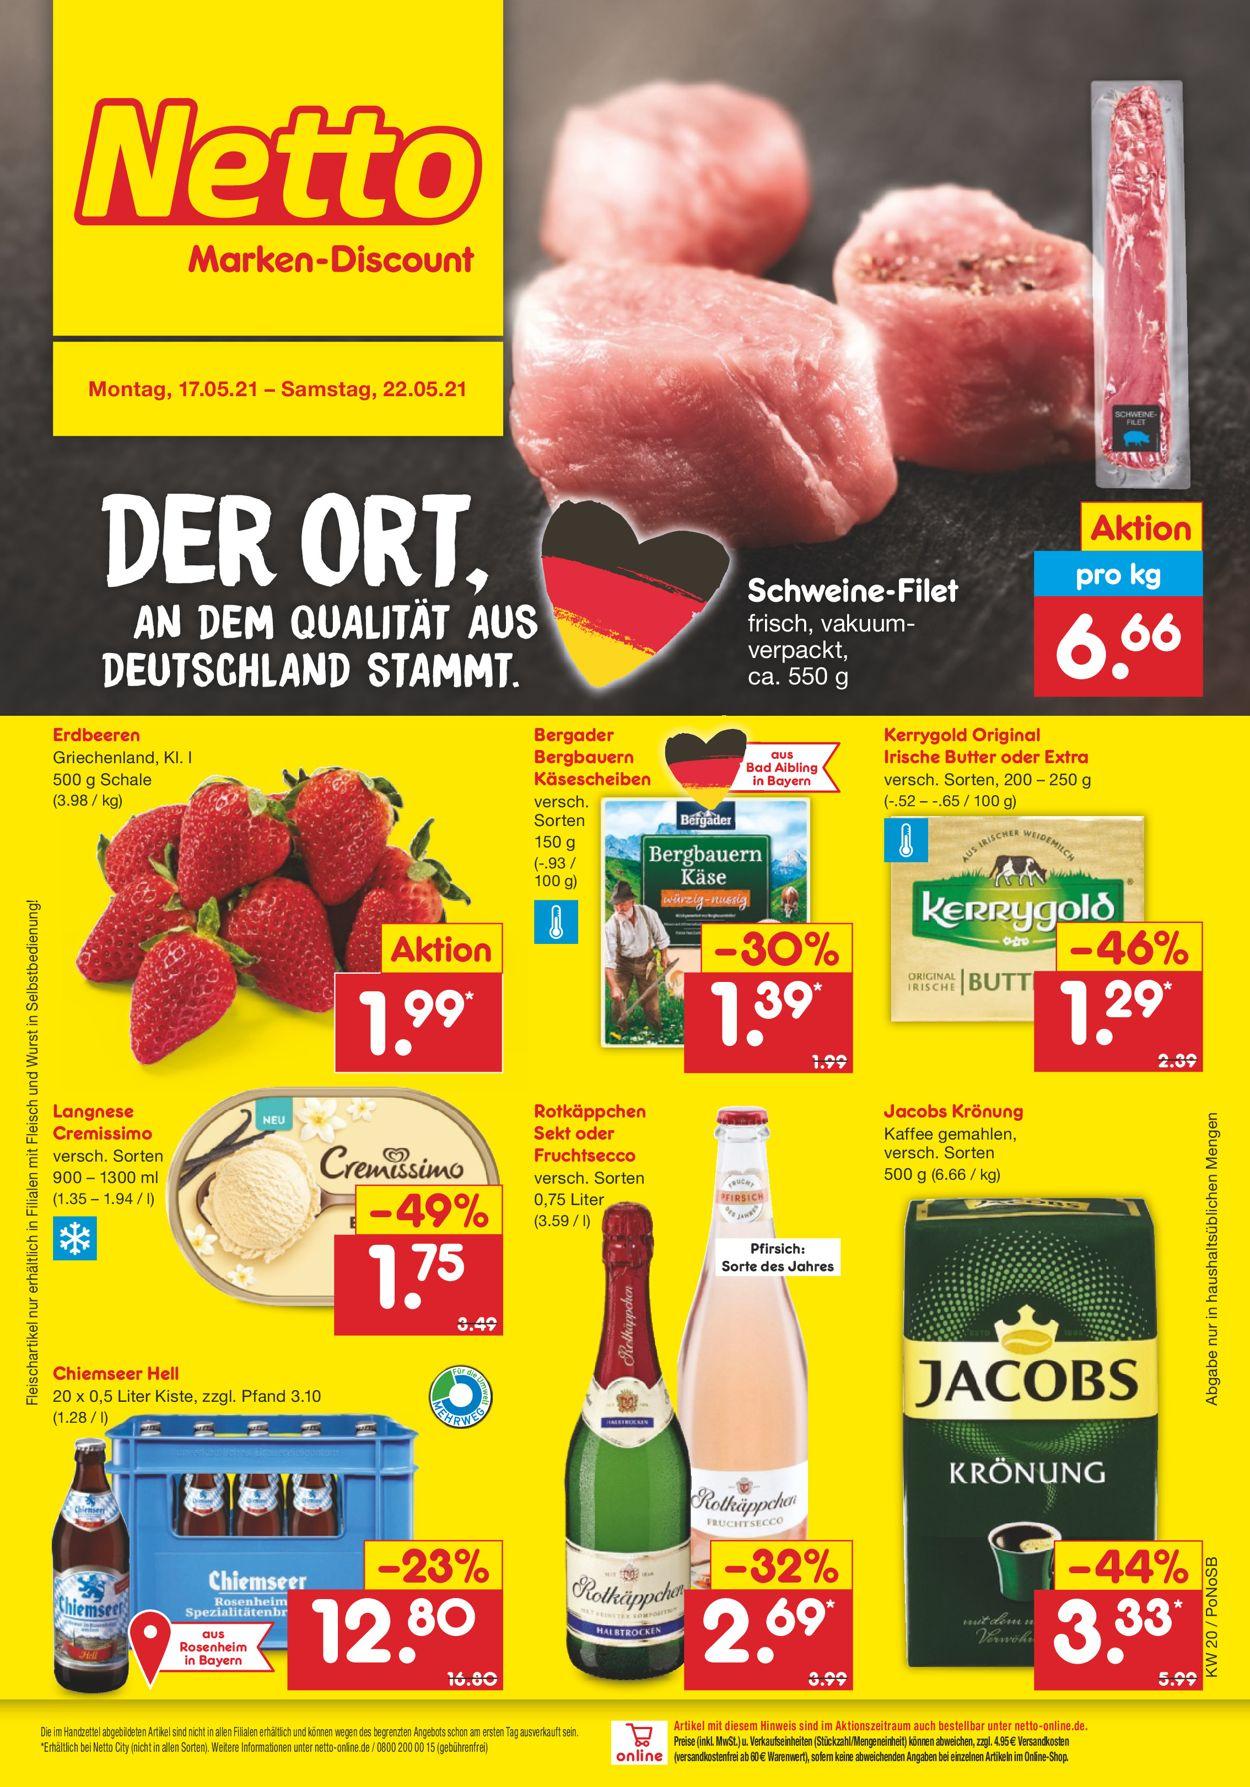 Netto Marken Discount Aktueller Prospekt 20.20   20.20.20 ...